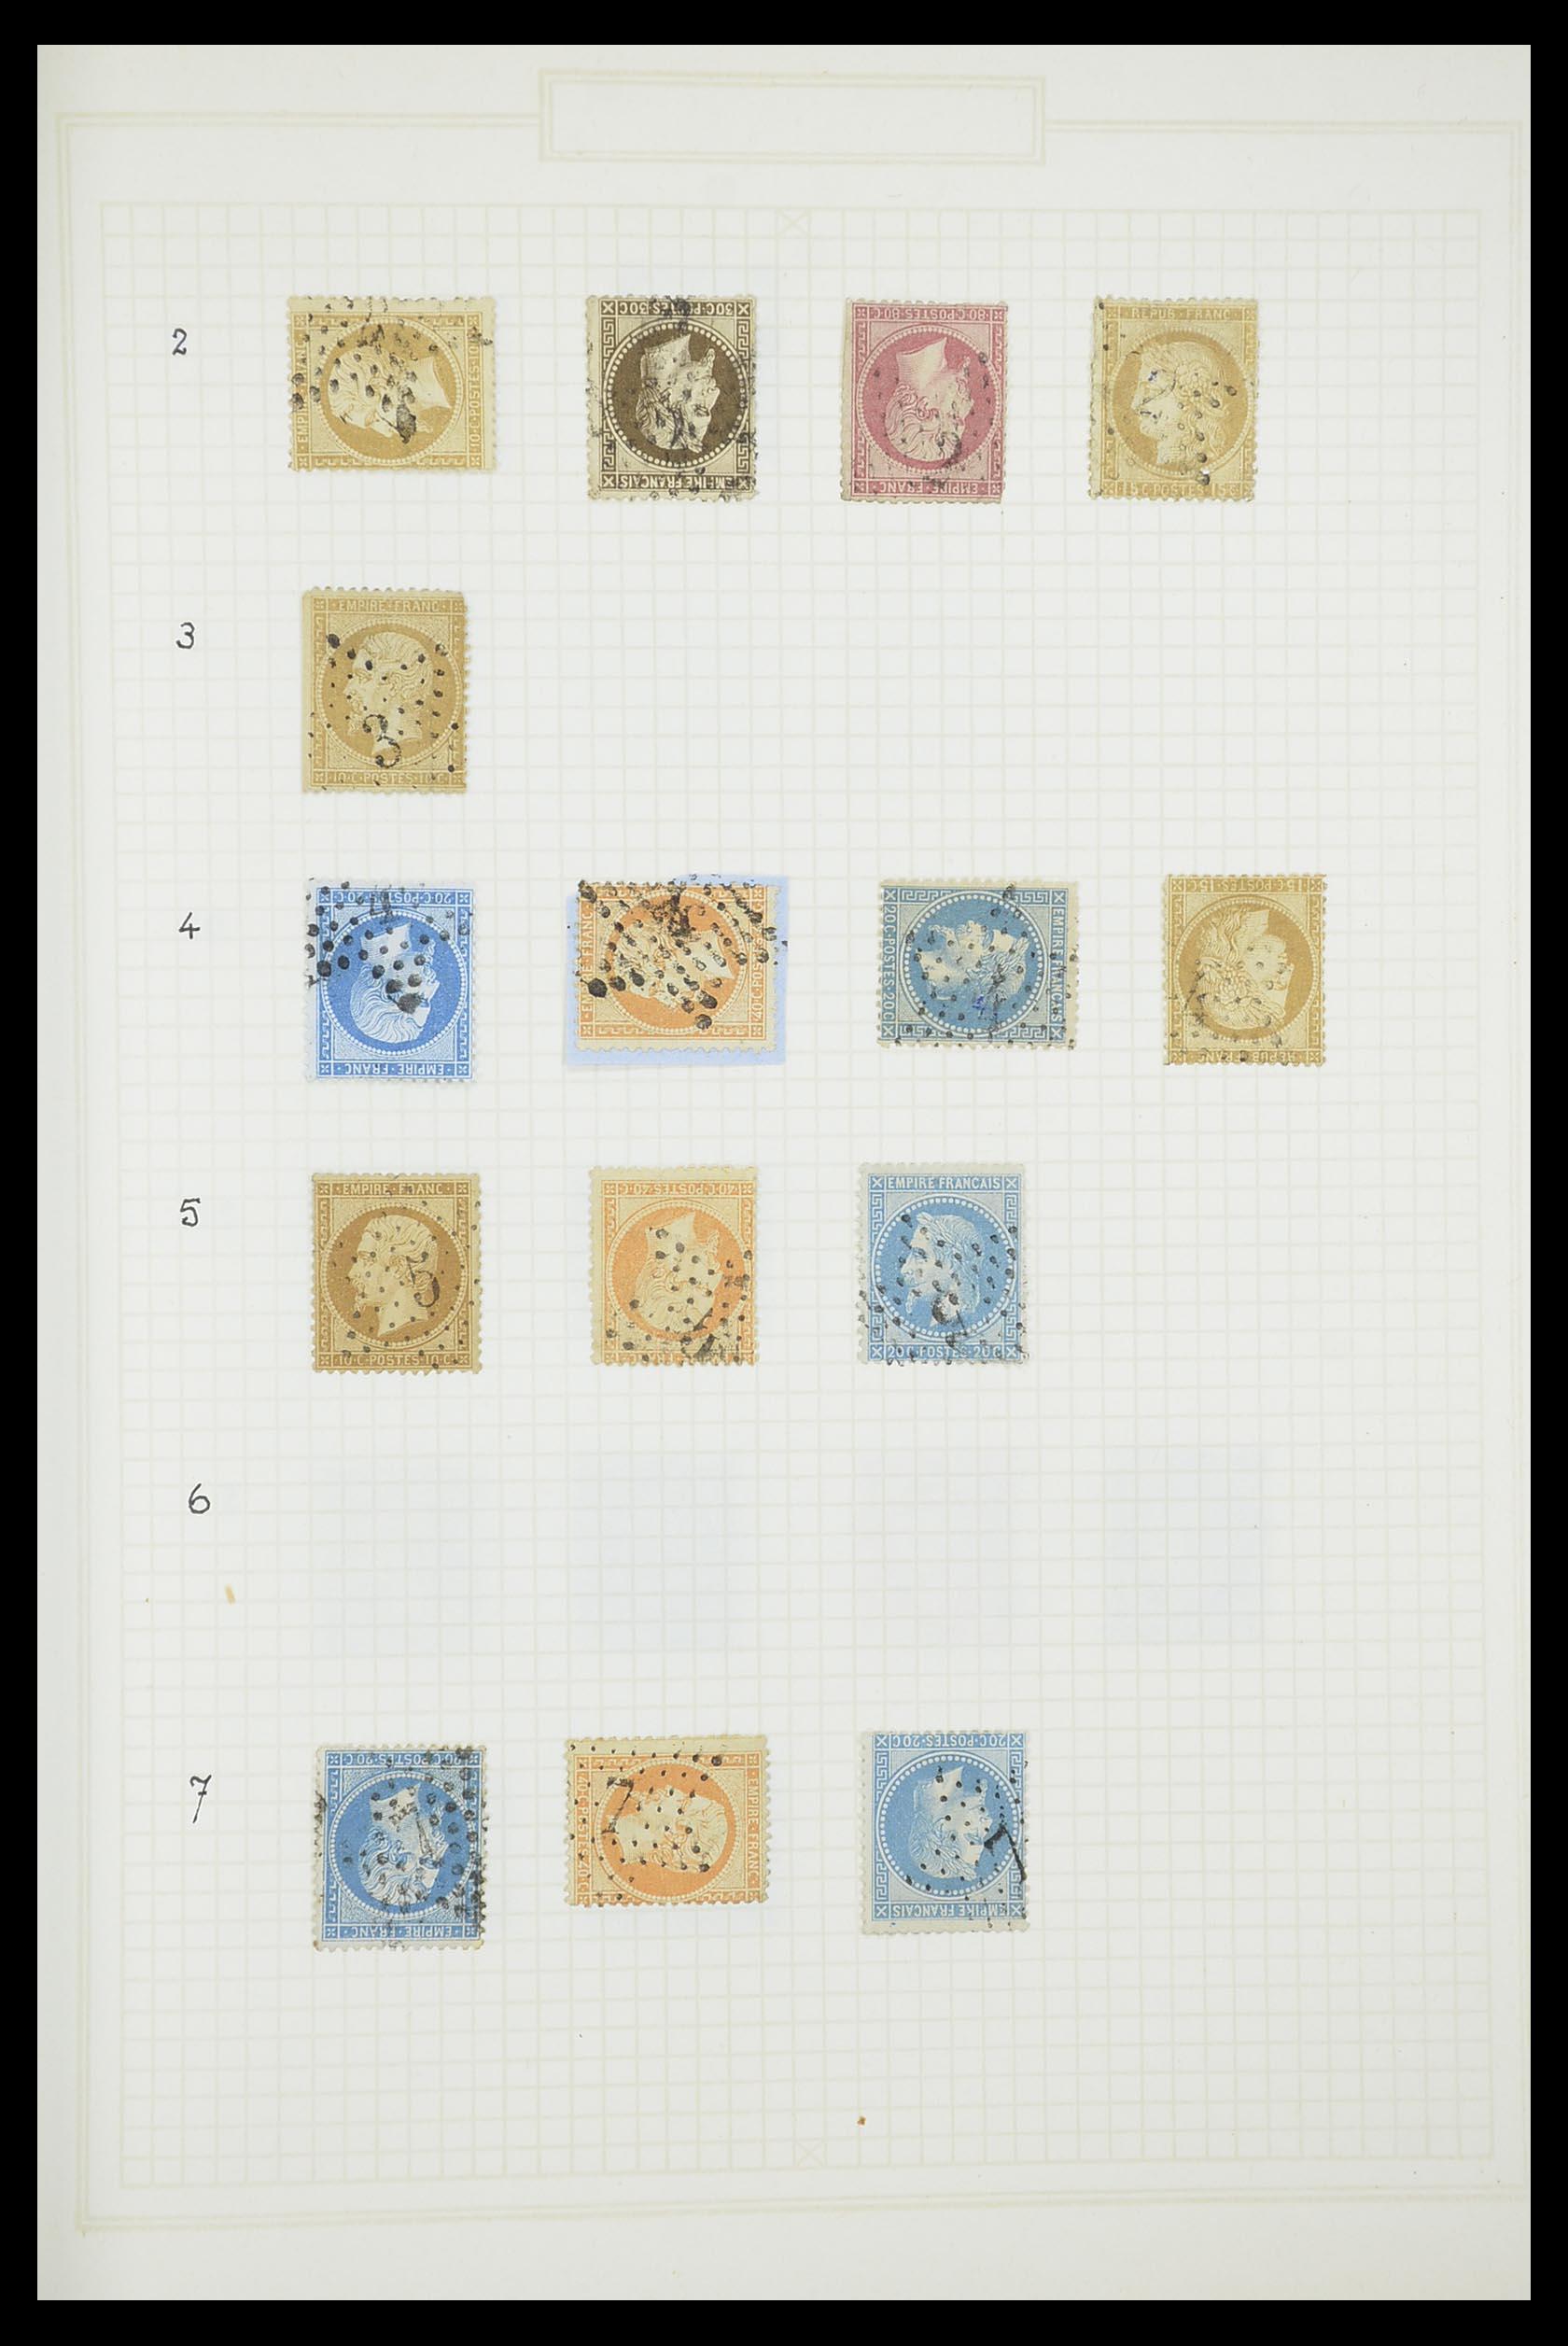 33851 002 - Postzegelverzameling 33851 Frankrijk klassiek stempels.